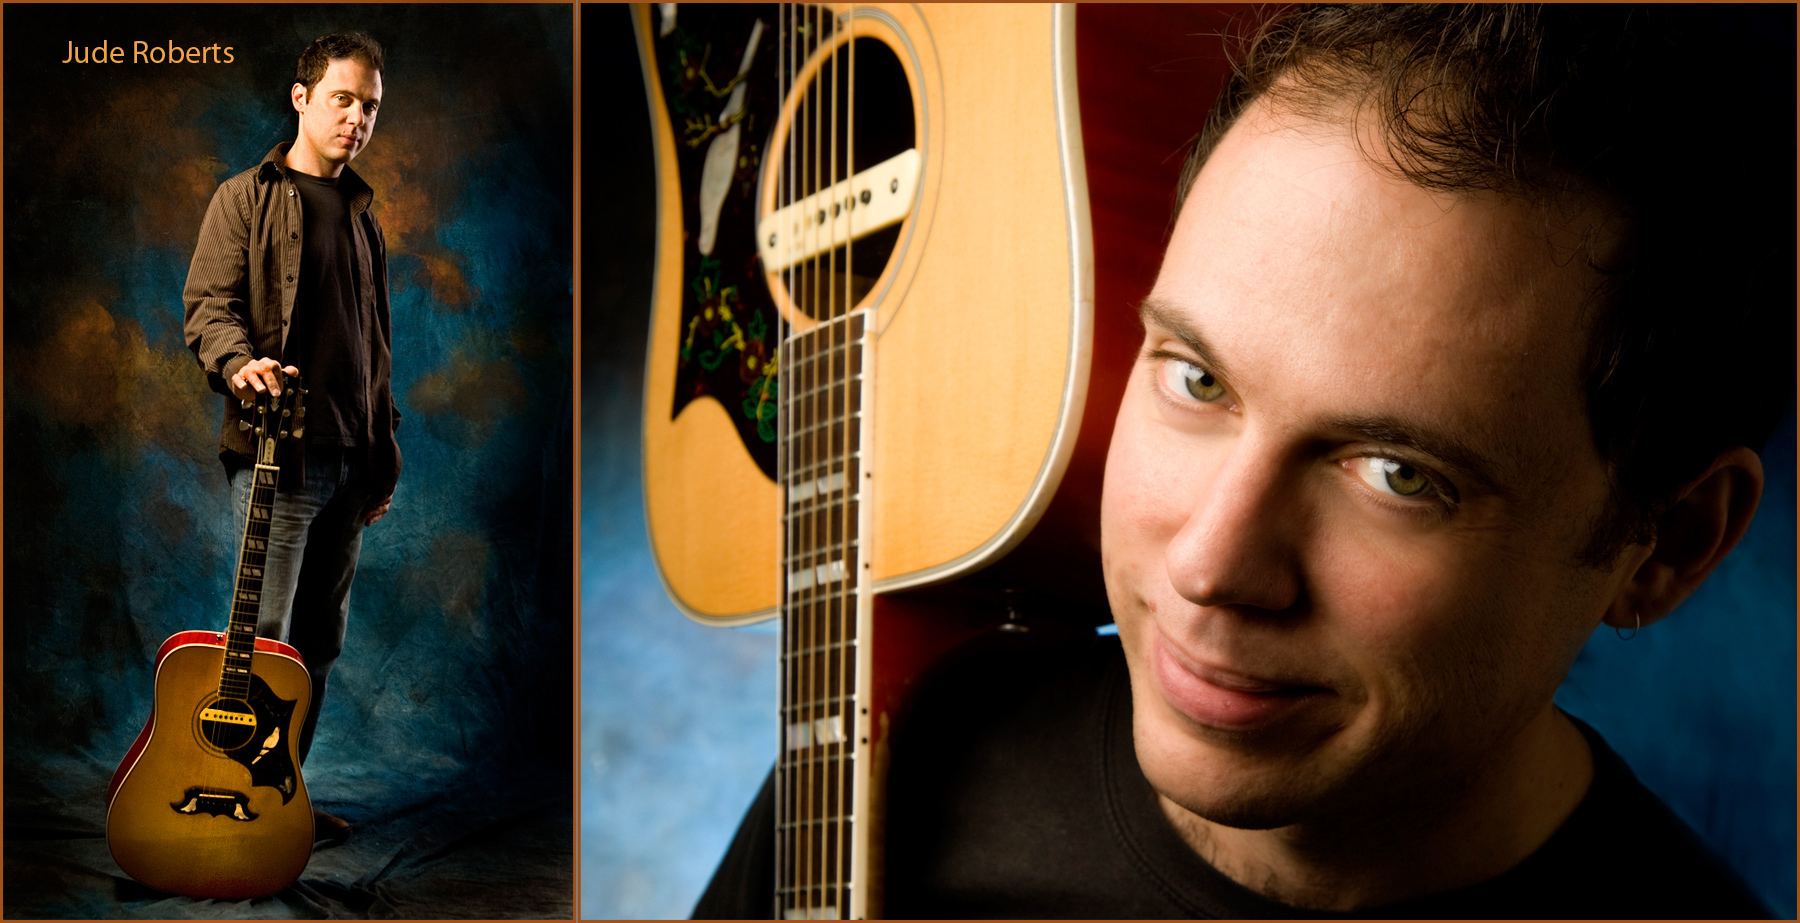 Jude-Musicman Photography